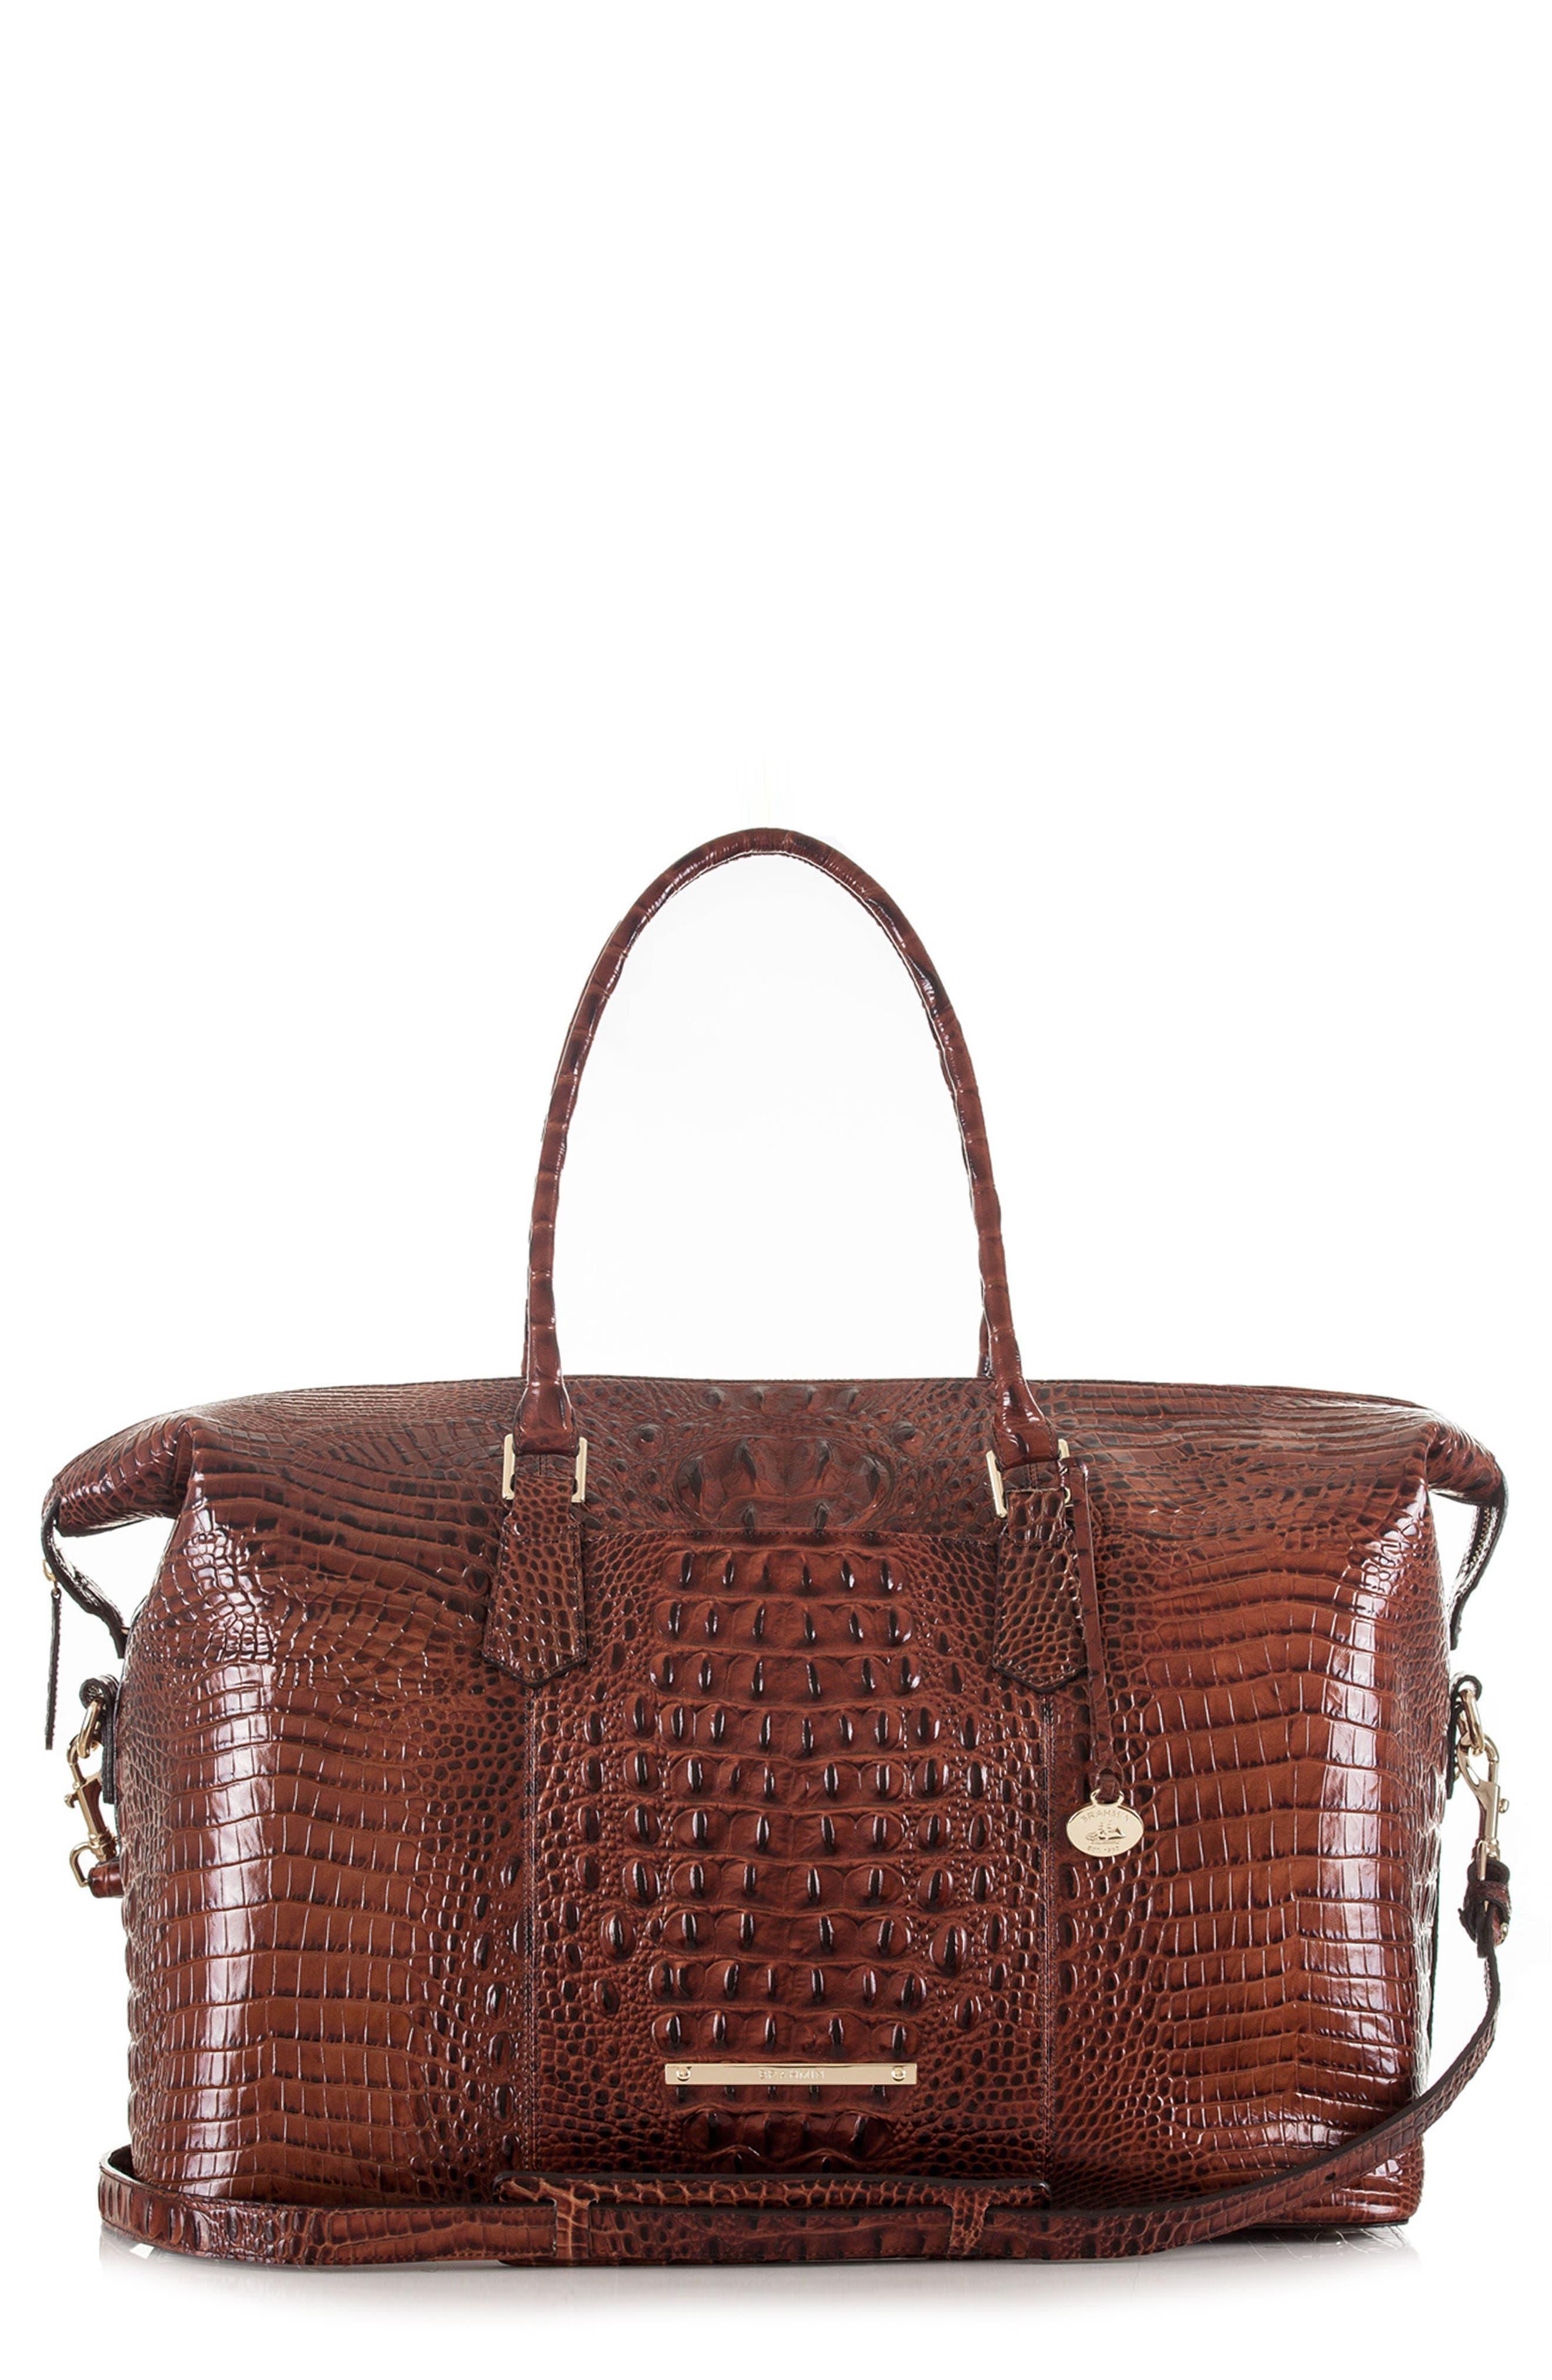 Alternate Image 1 Selected - Brahmin 'Duxbury' Leather Travel Bag